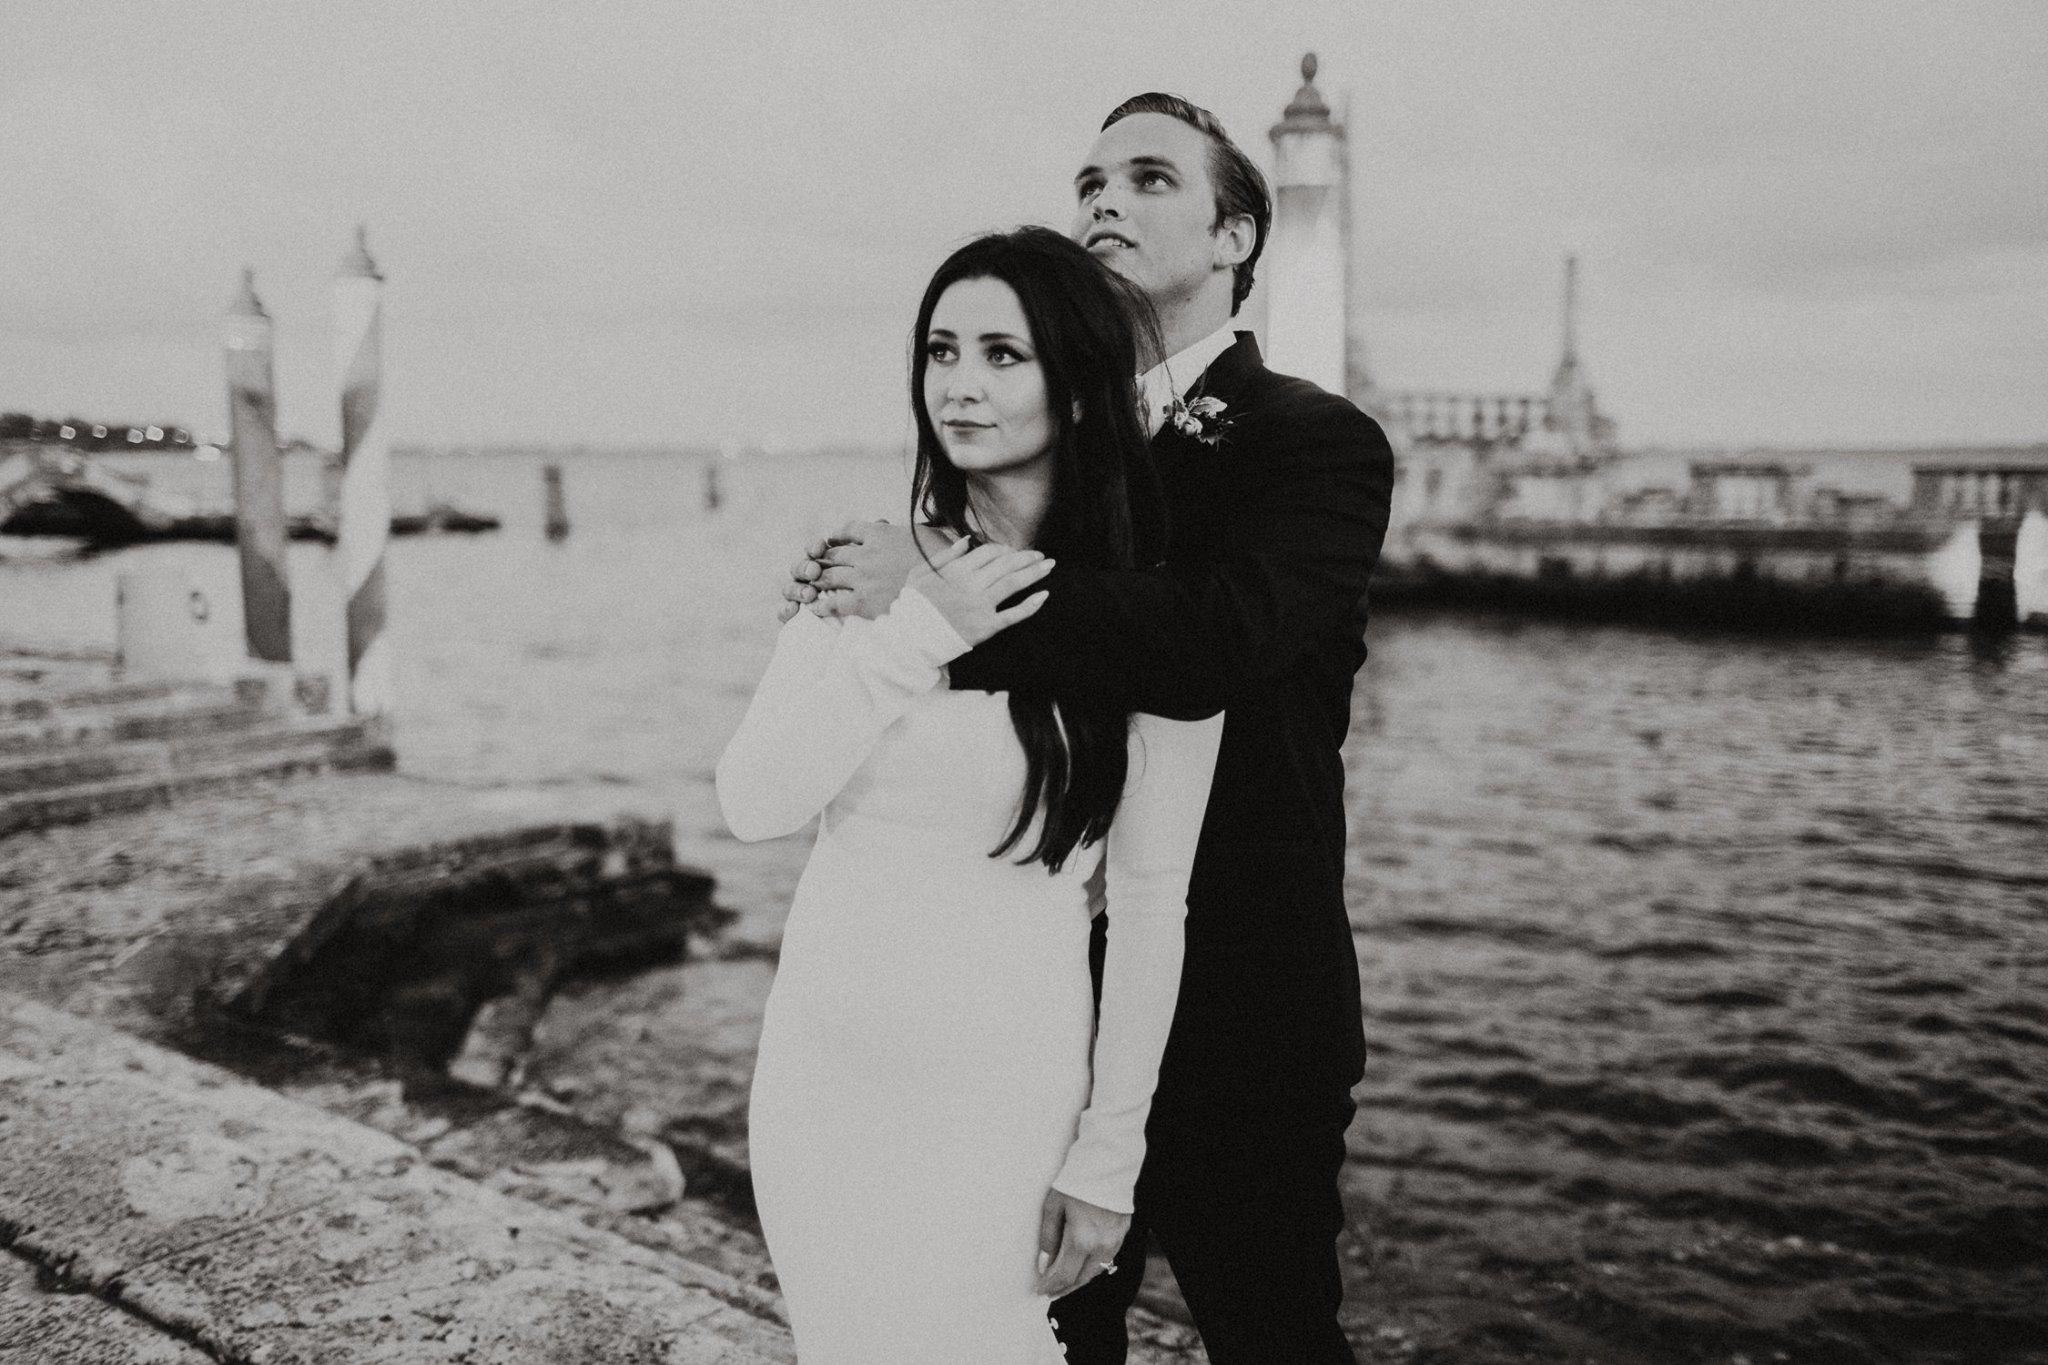 Miami Vizcya Destination Wedding